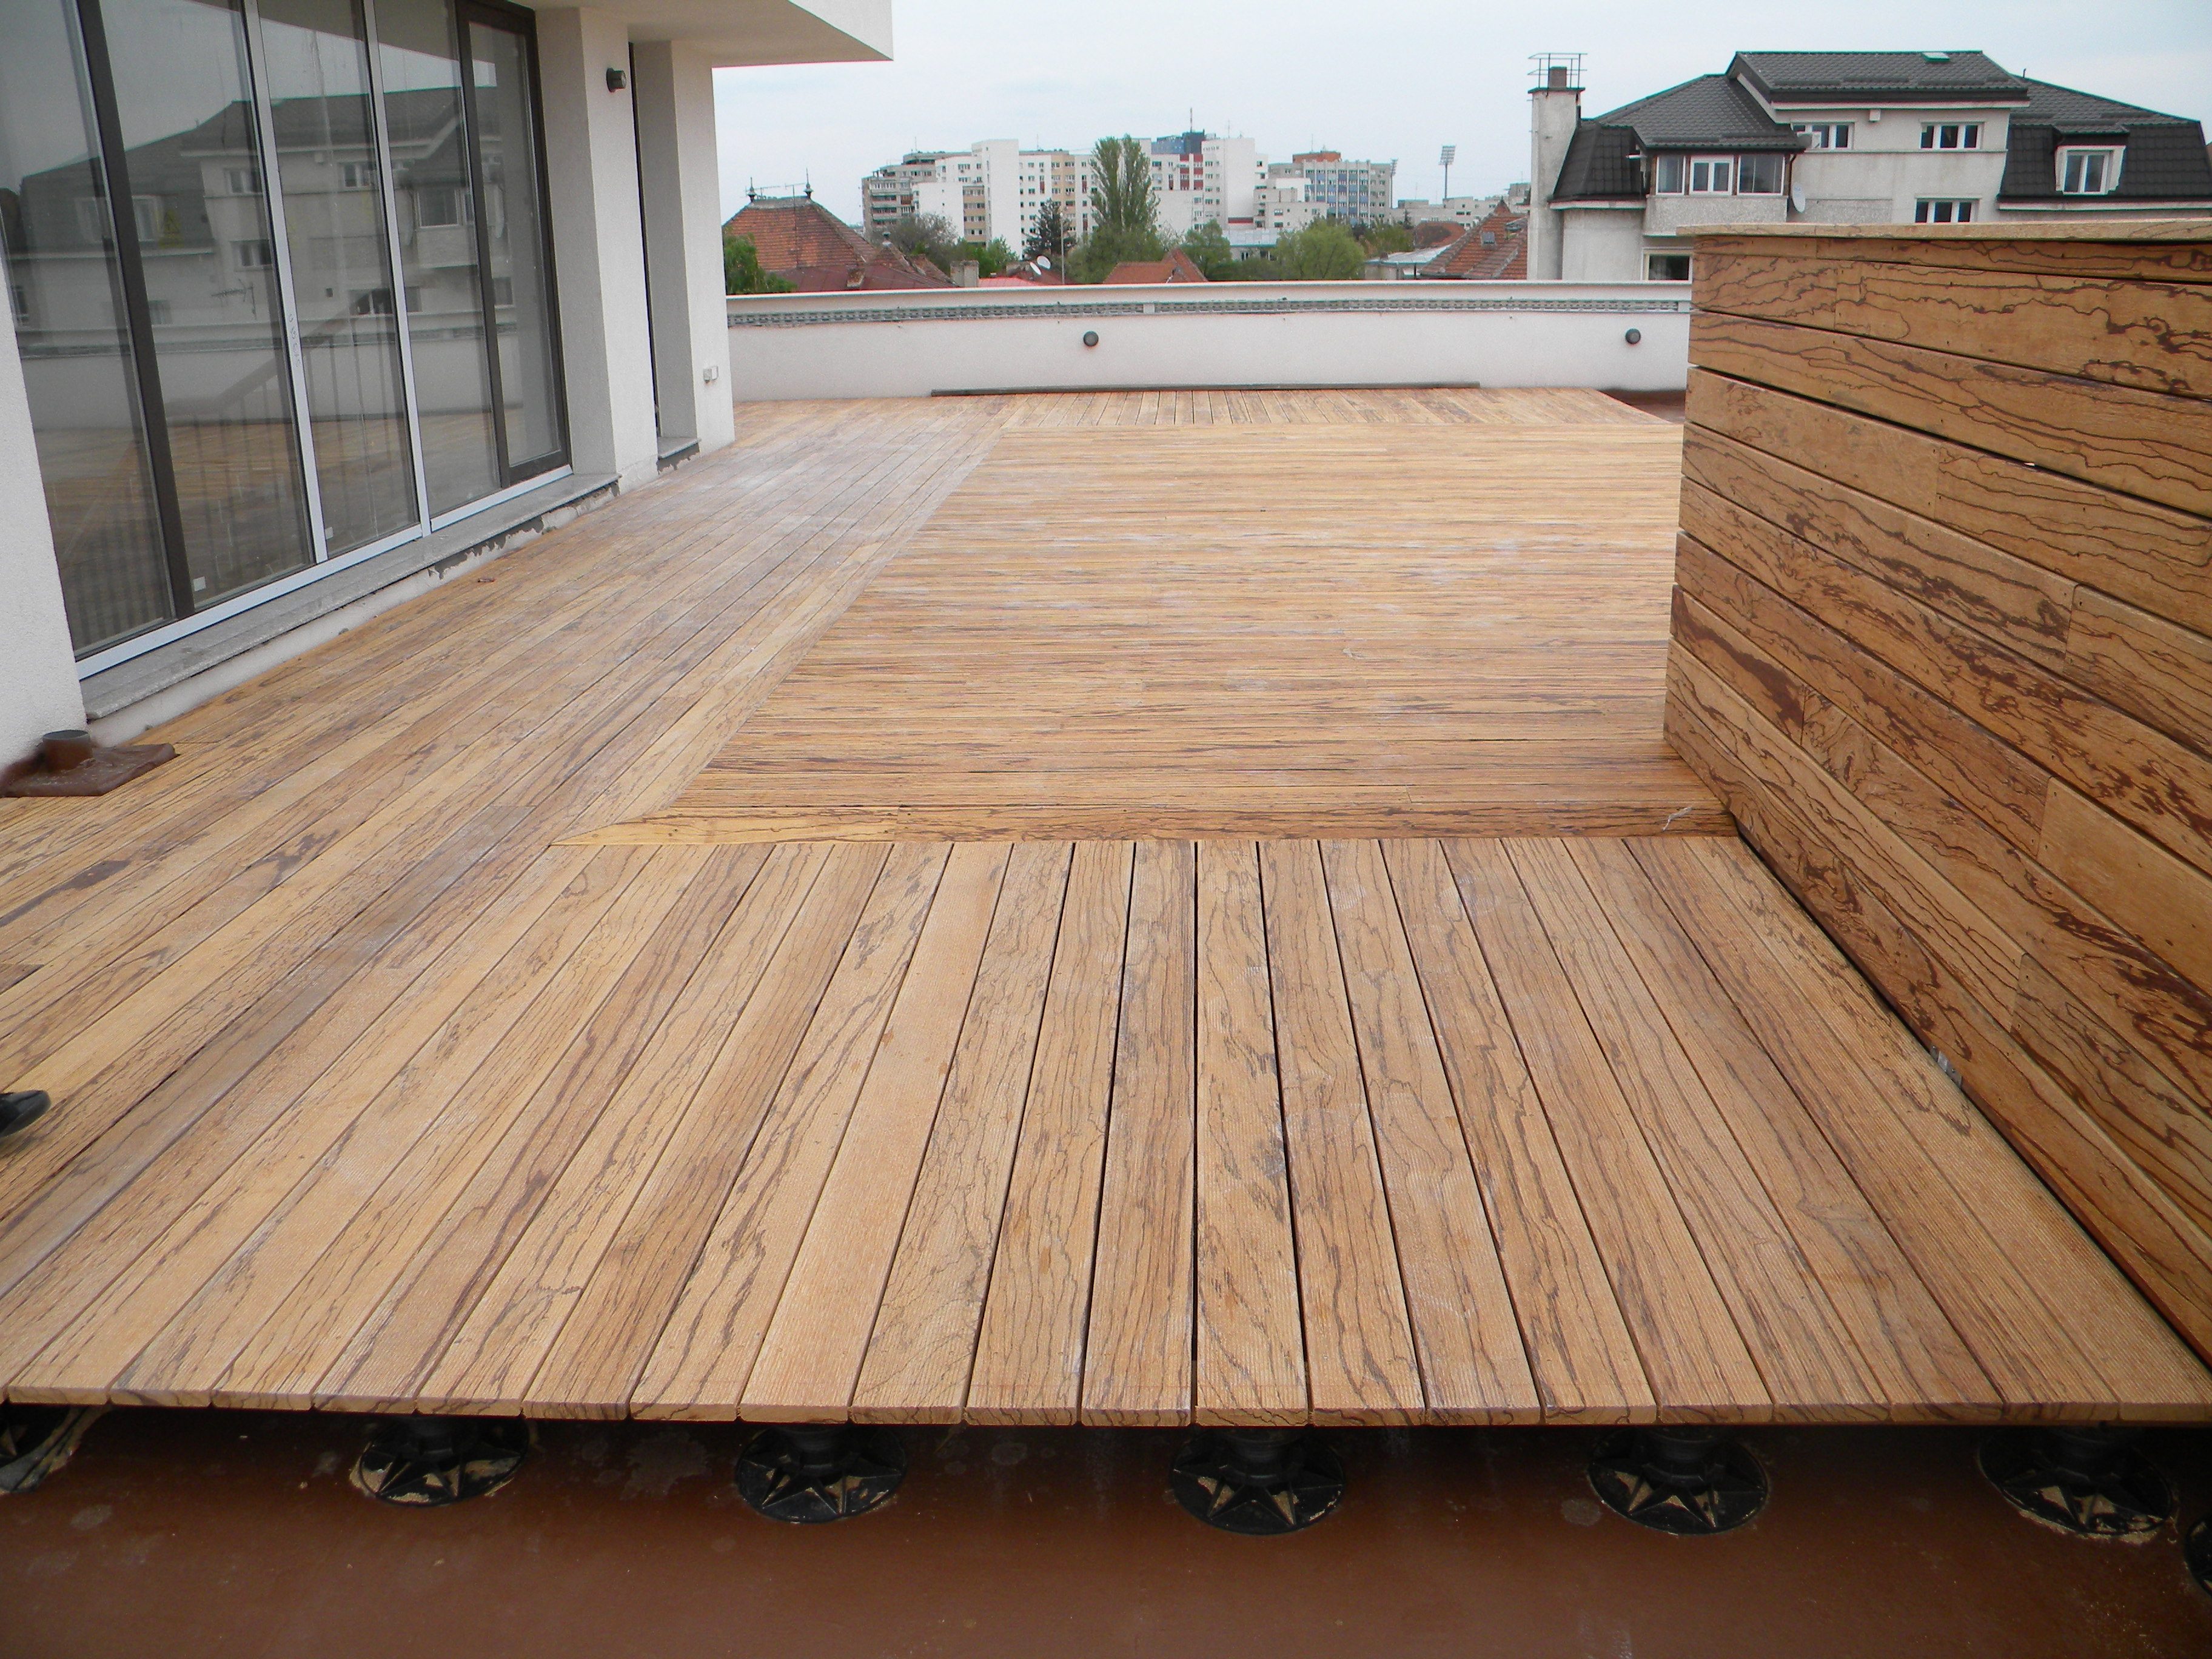 Deck-uri lemn - Angelim Rajado SELVA FLOORS - Poza 2